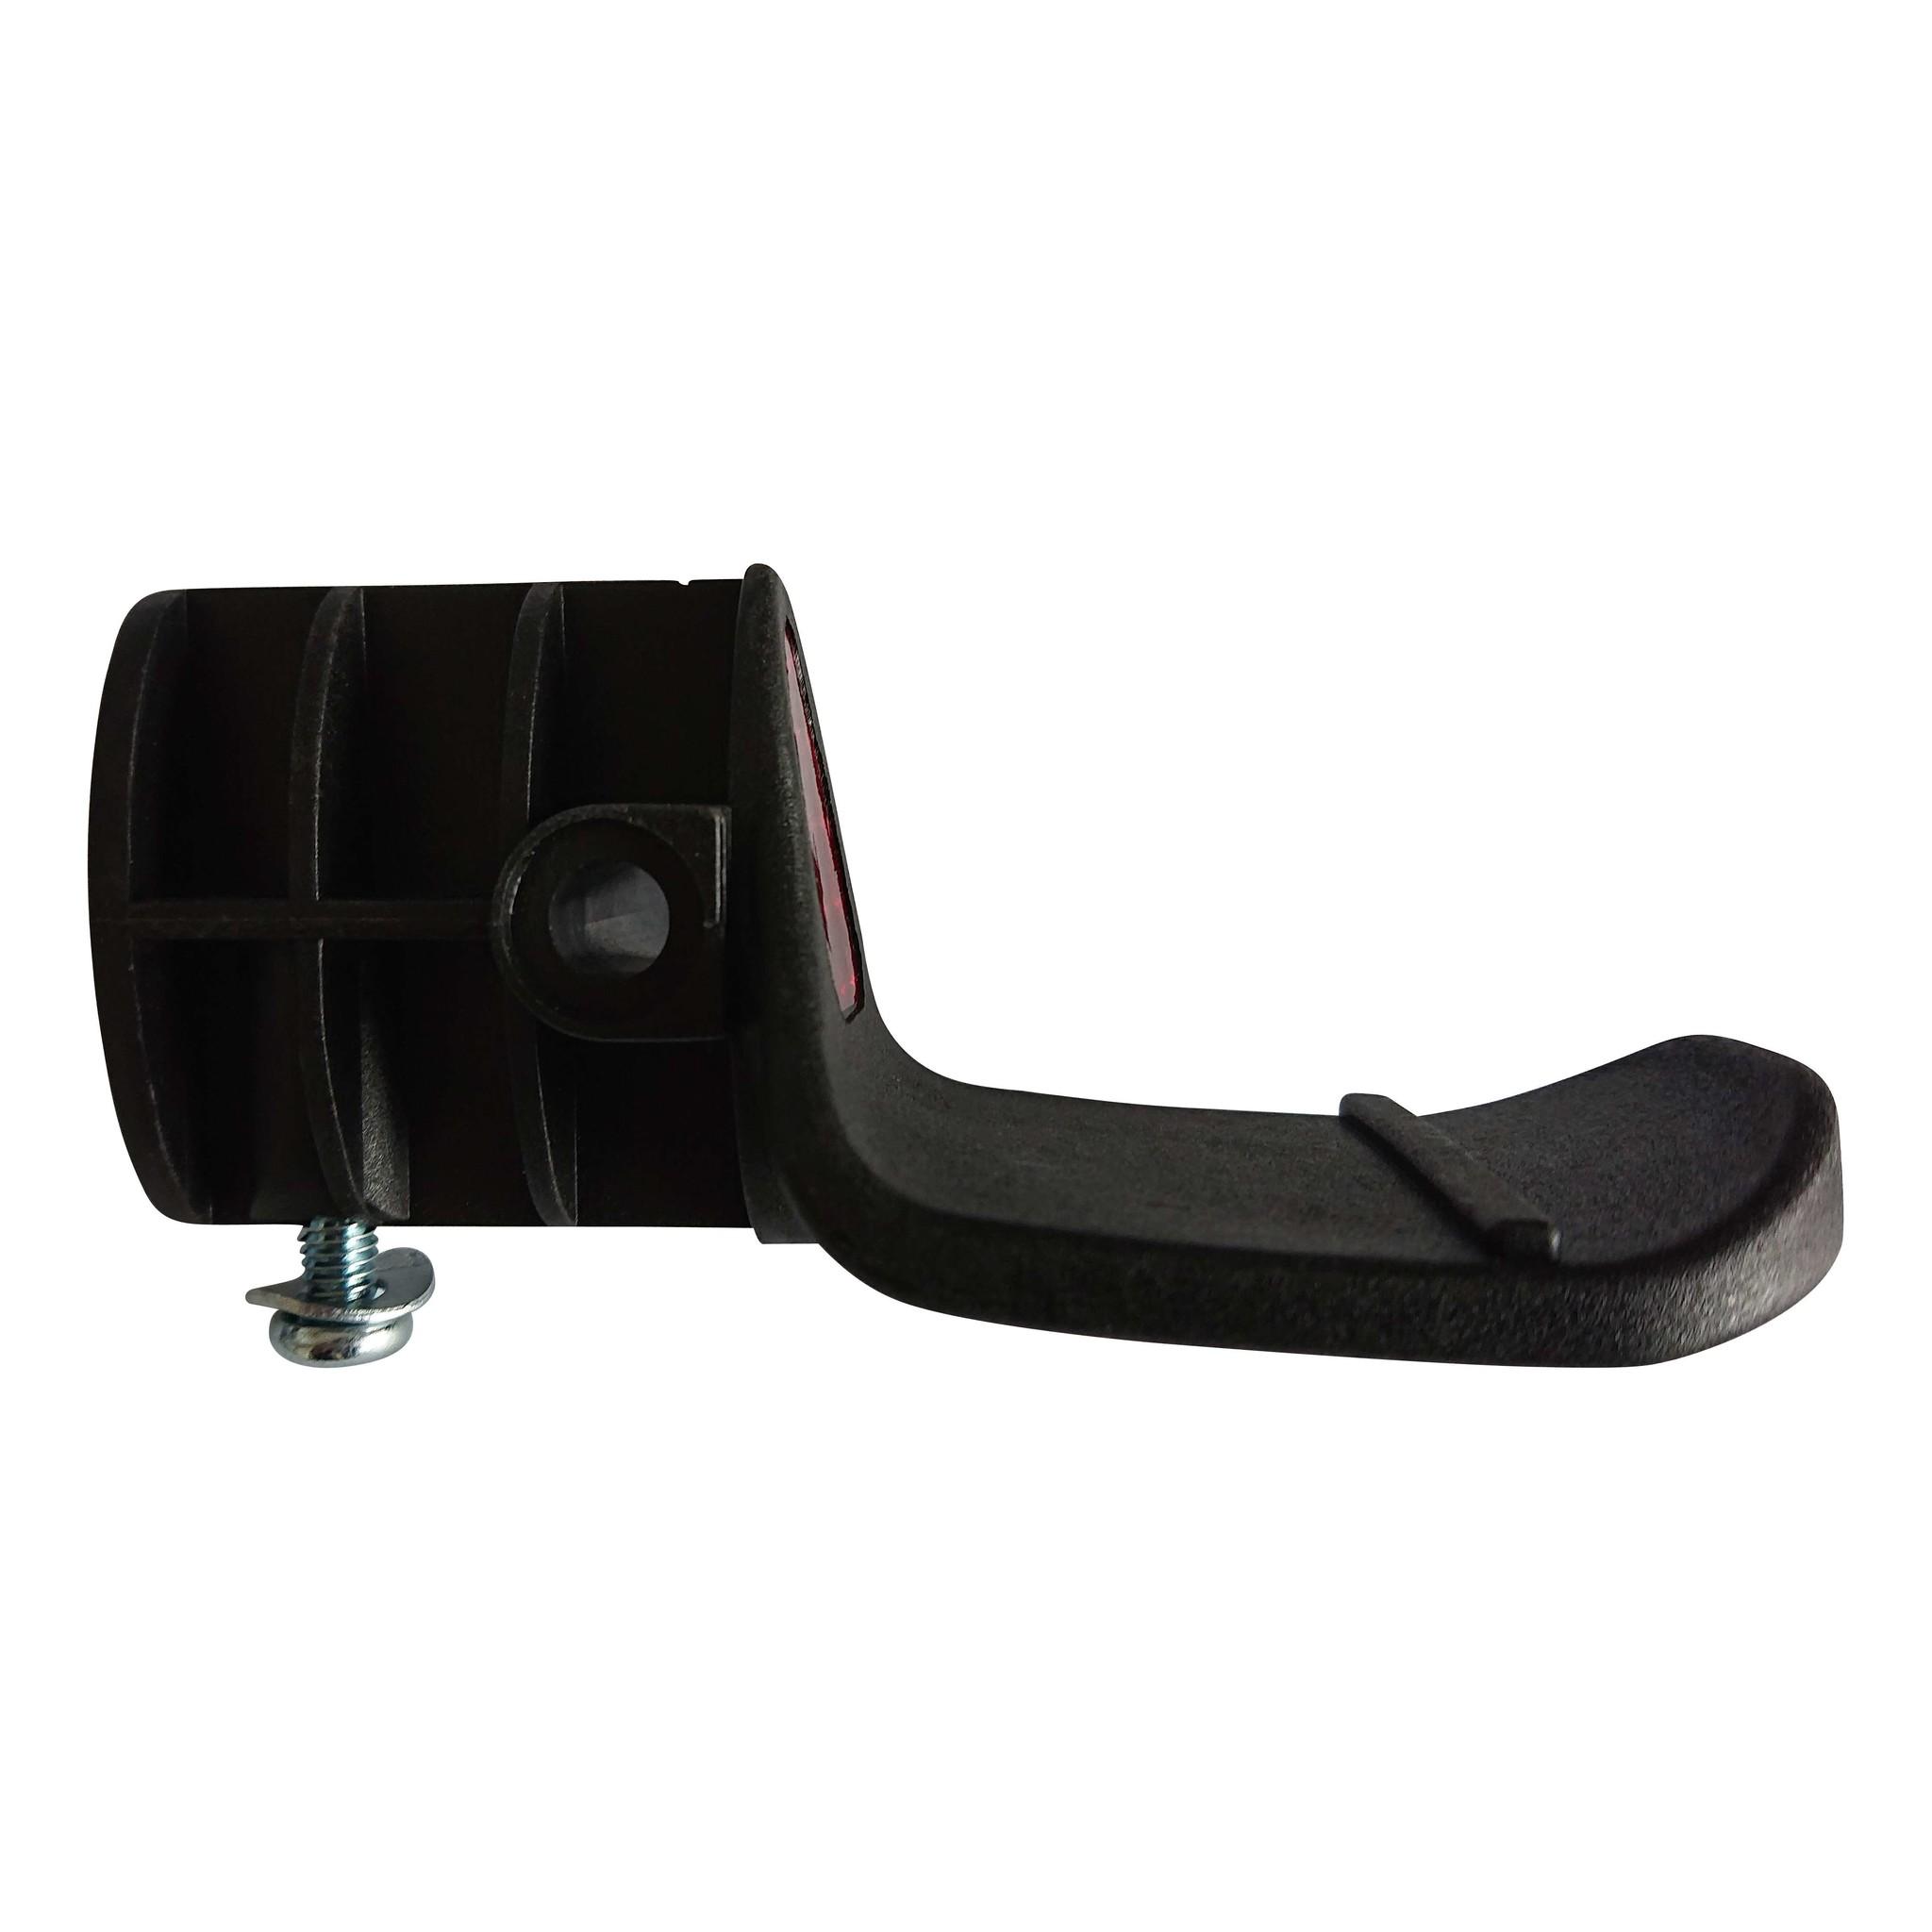 Wheelzahead Tilpedal Rollator TRACK